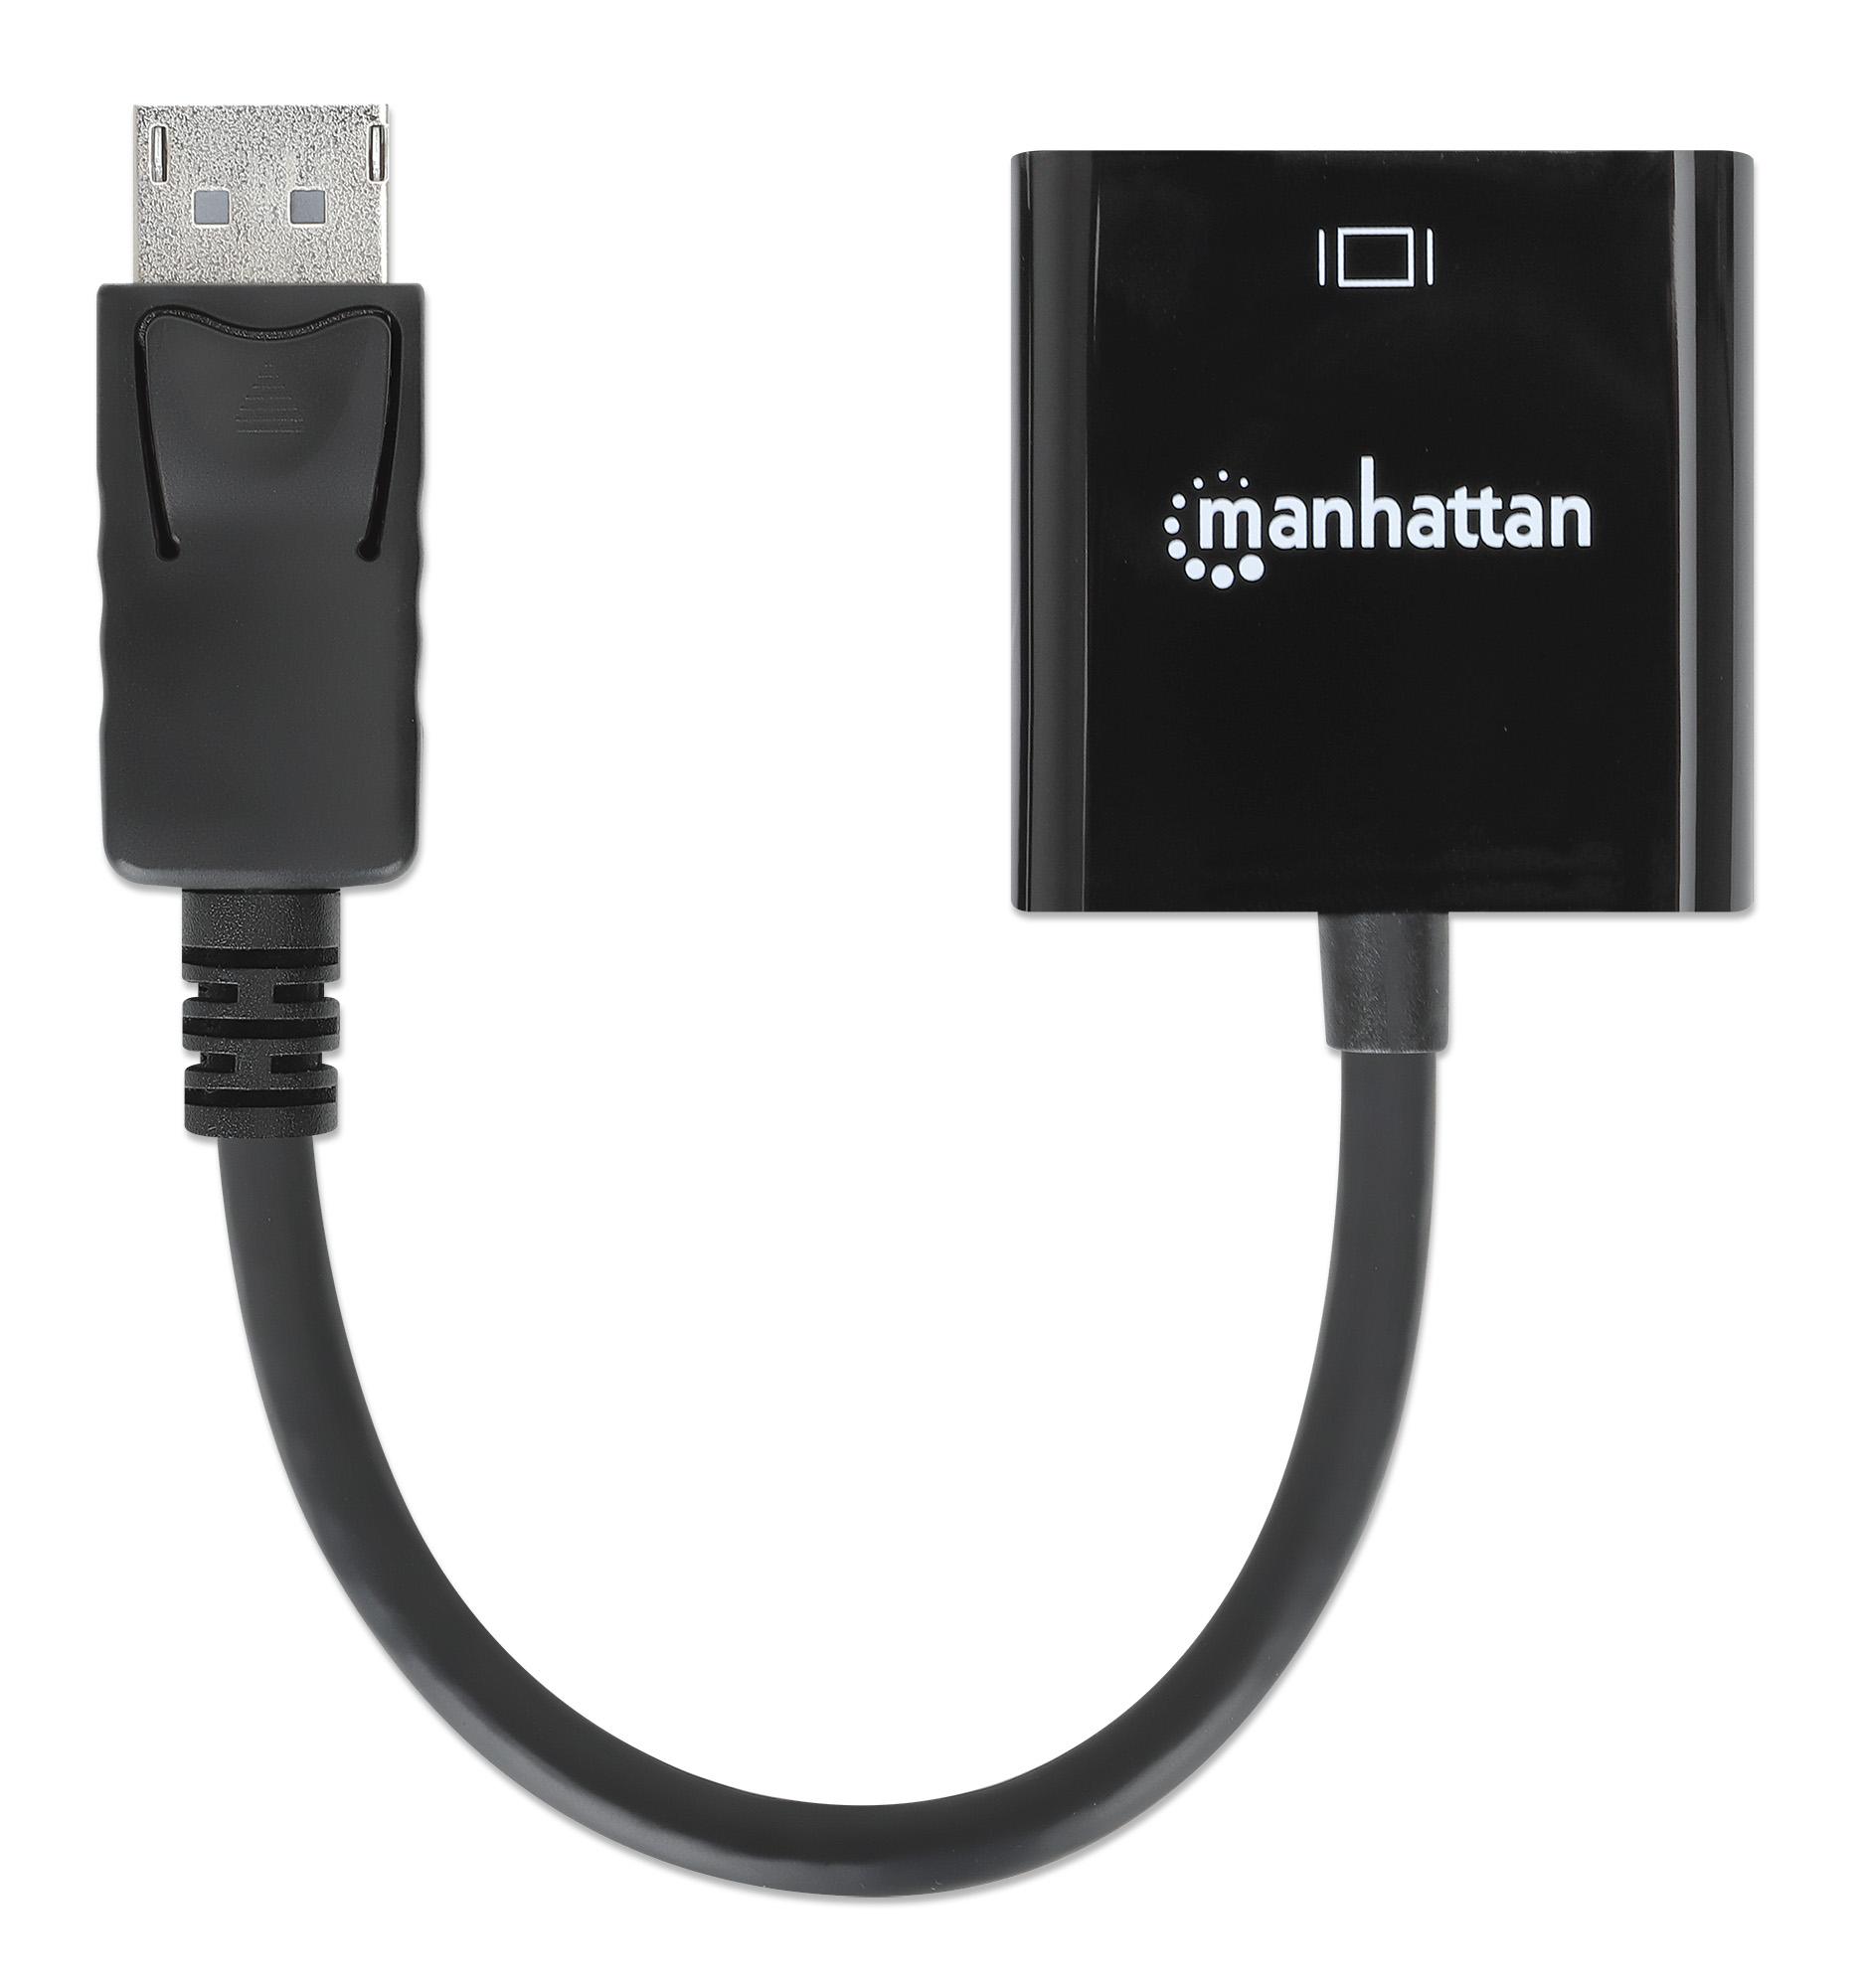 DisplayPort 1.2a to DVI-D Adapter